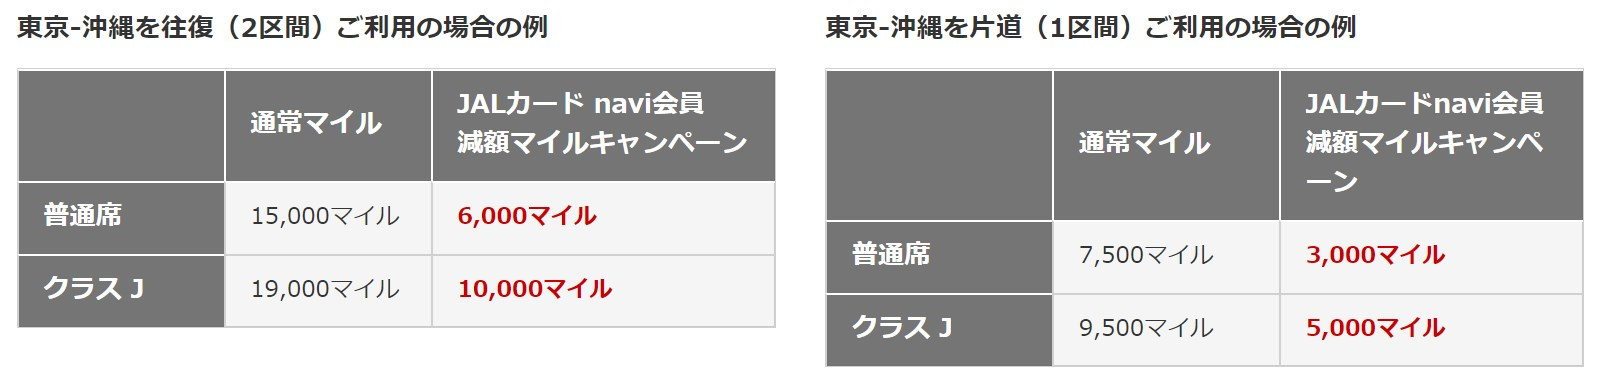 JALカード navi・減額マイルキャンペーン